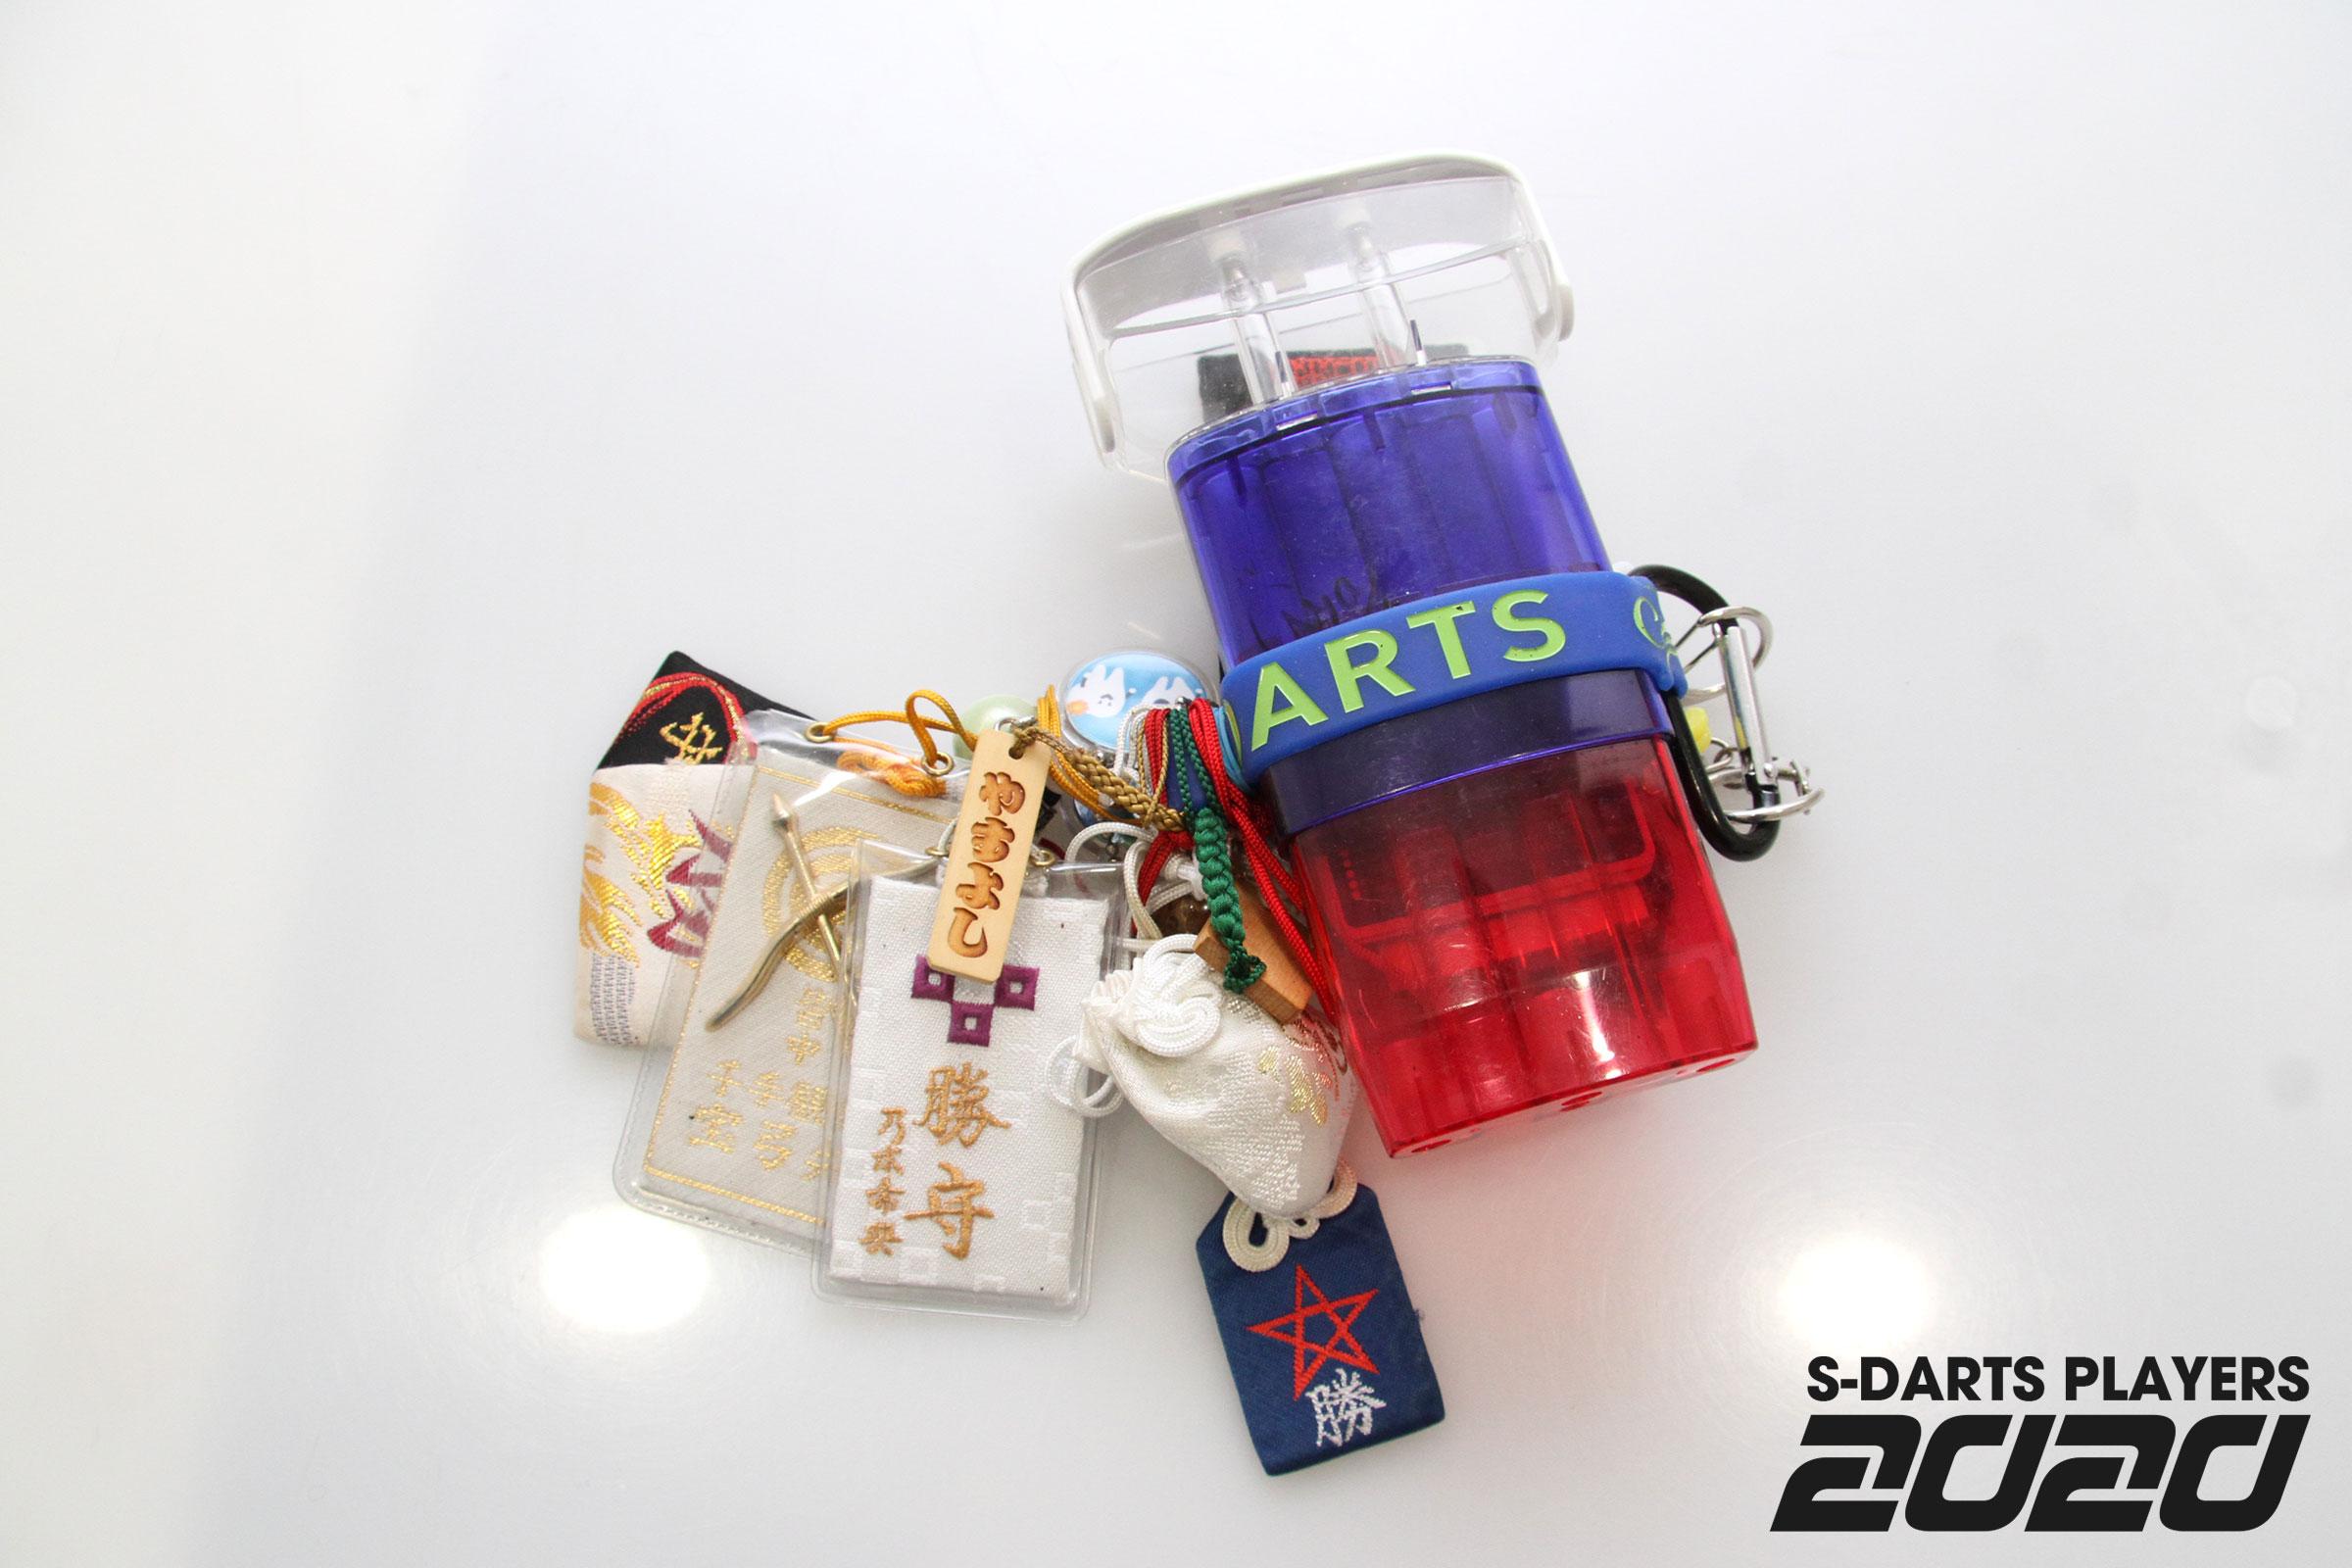 S-DARTS PLAYERS 2020│松本康寿